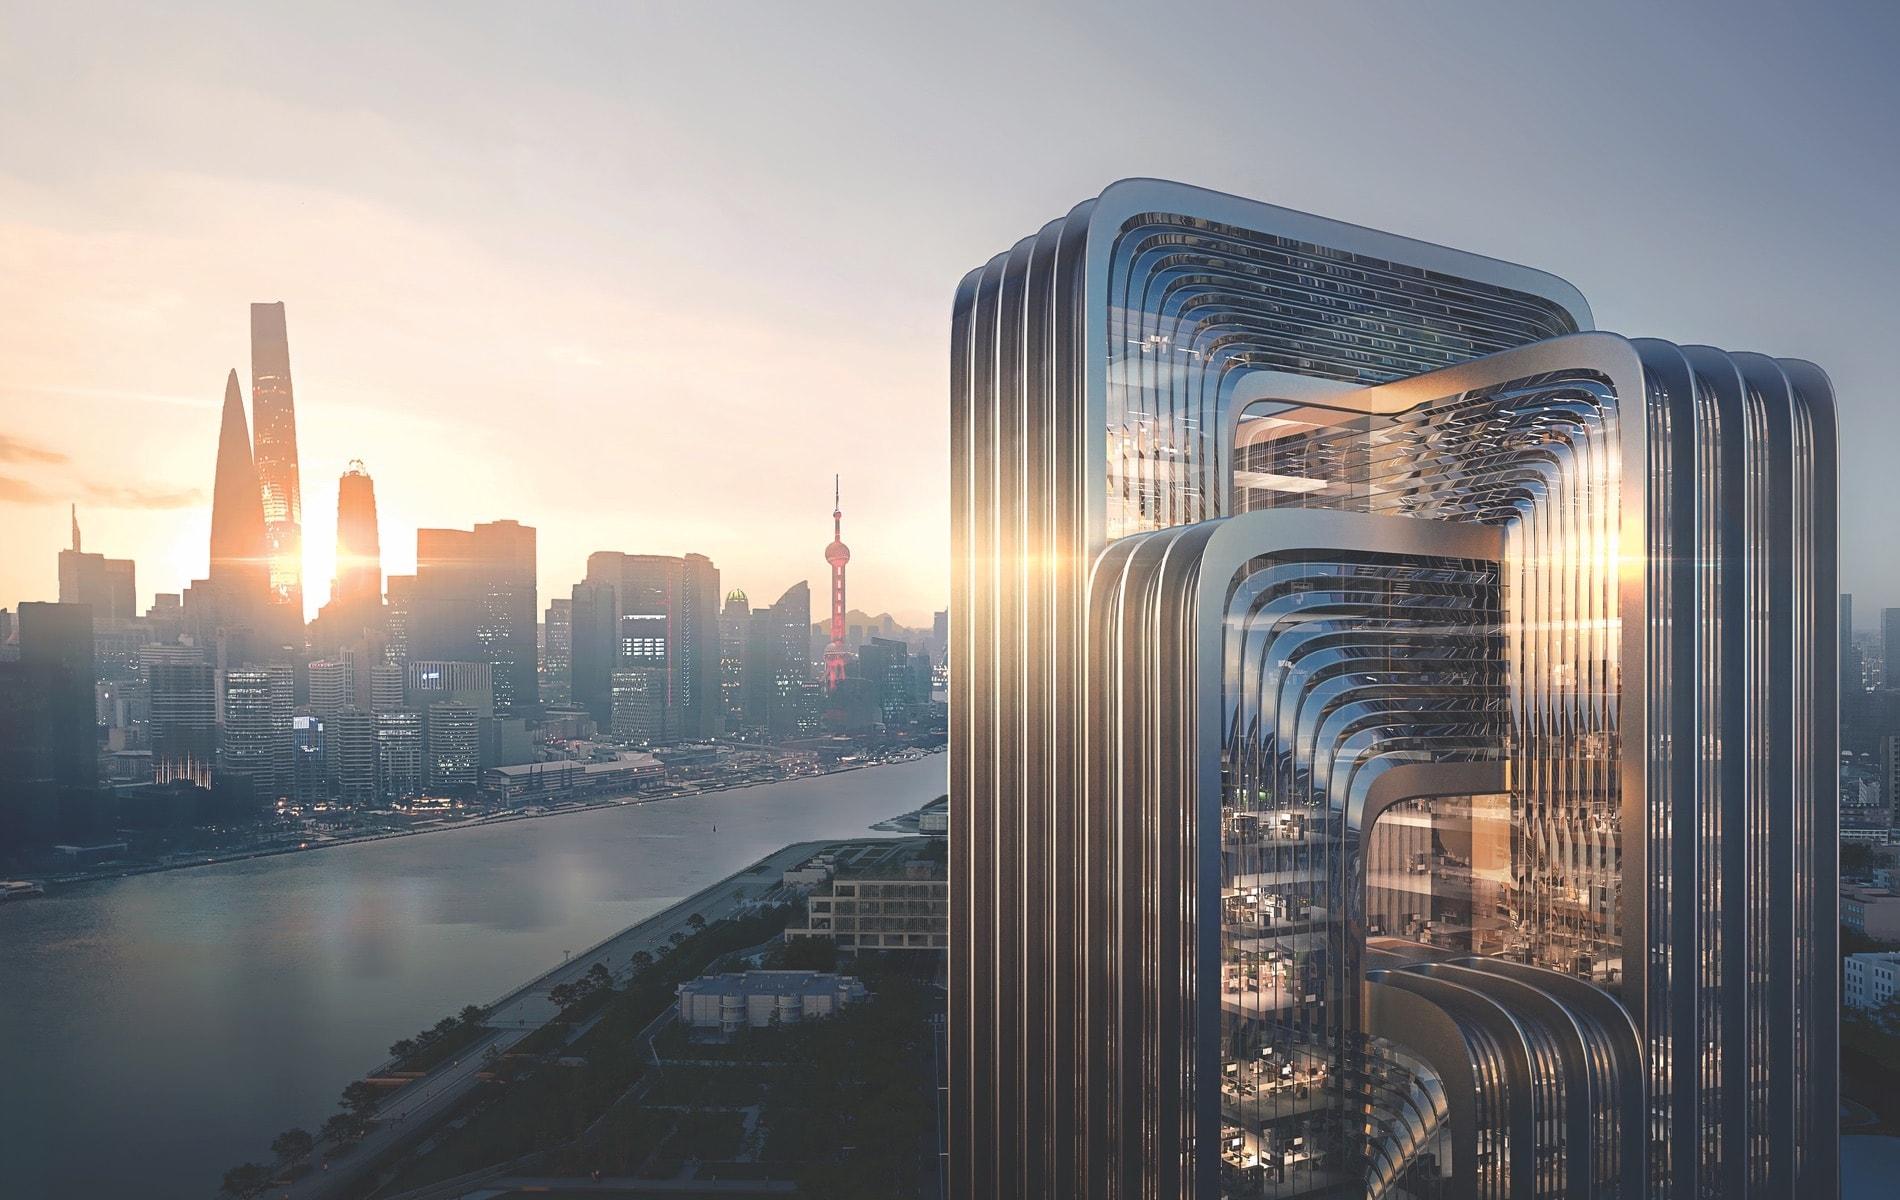 Negativ, Zaha Hadid Architects, China Energy Conservation and Environmental Protection Group, Three Star Green Building Rating